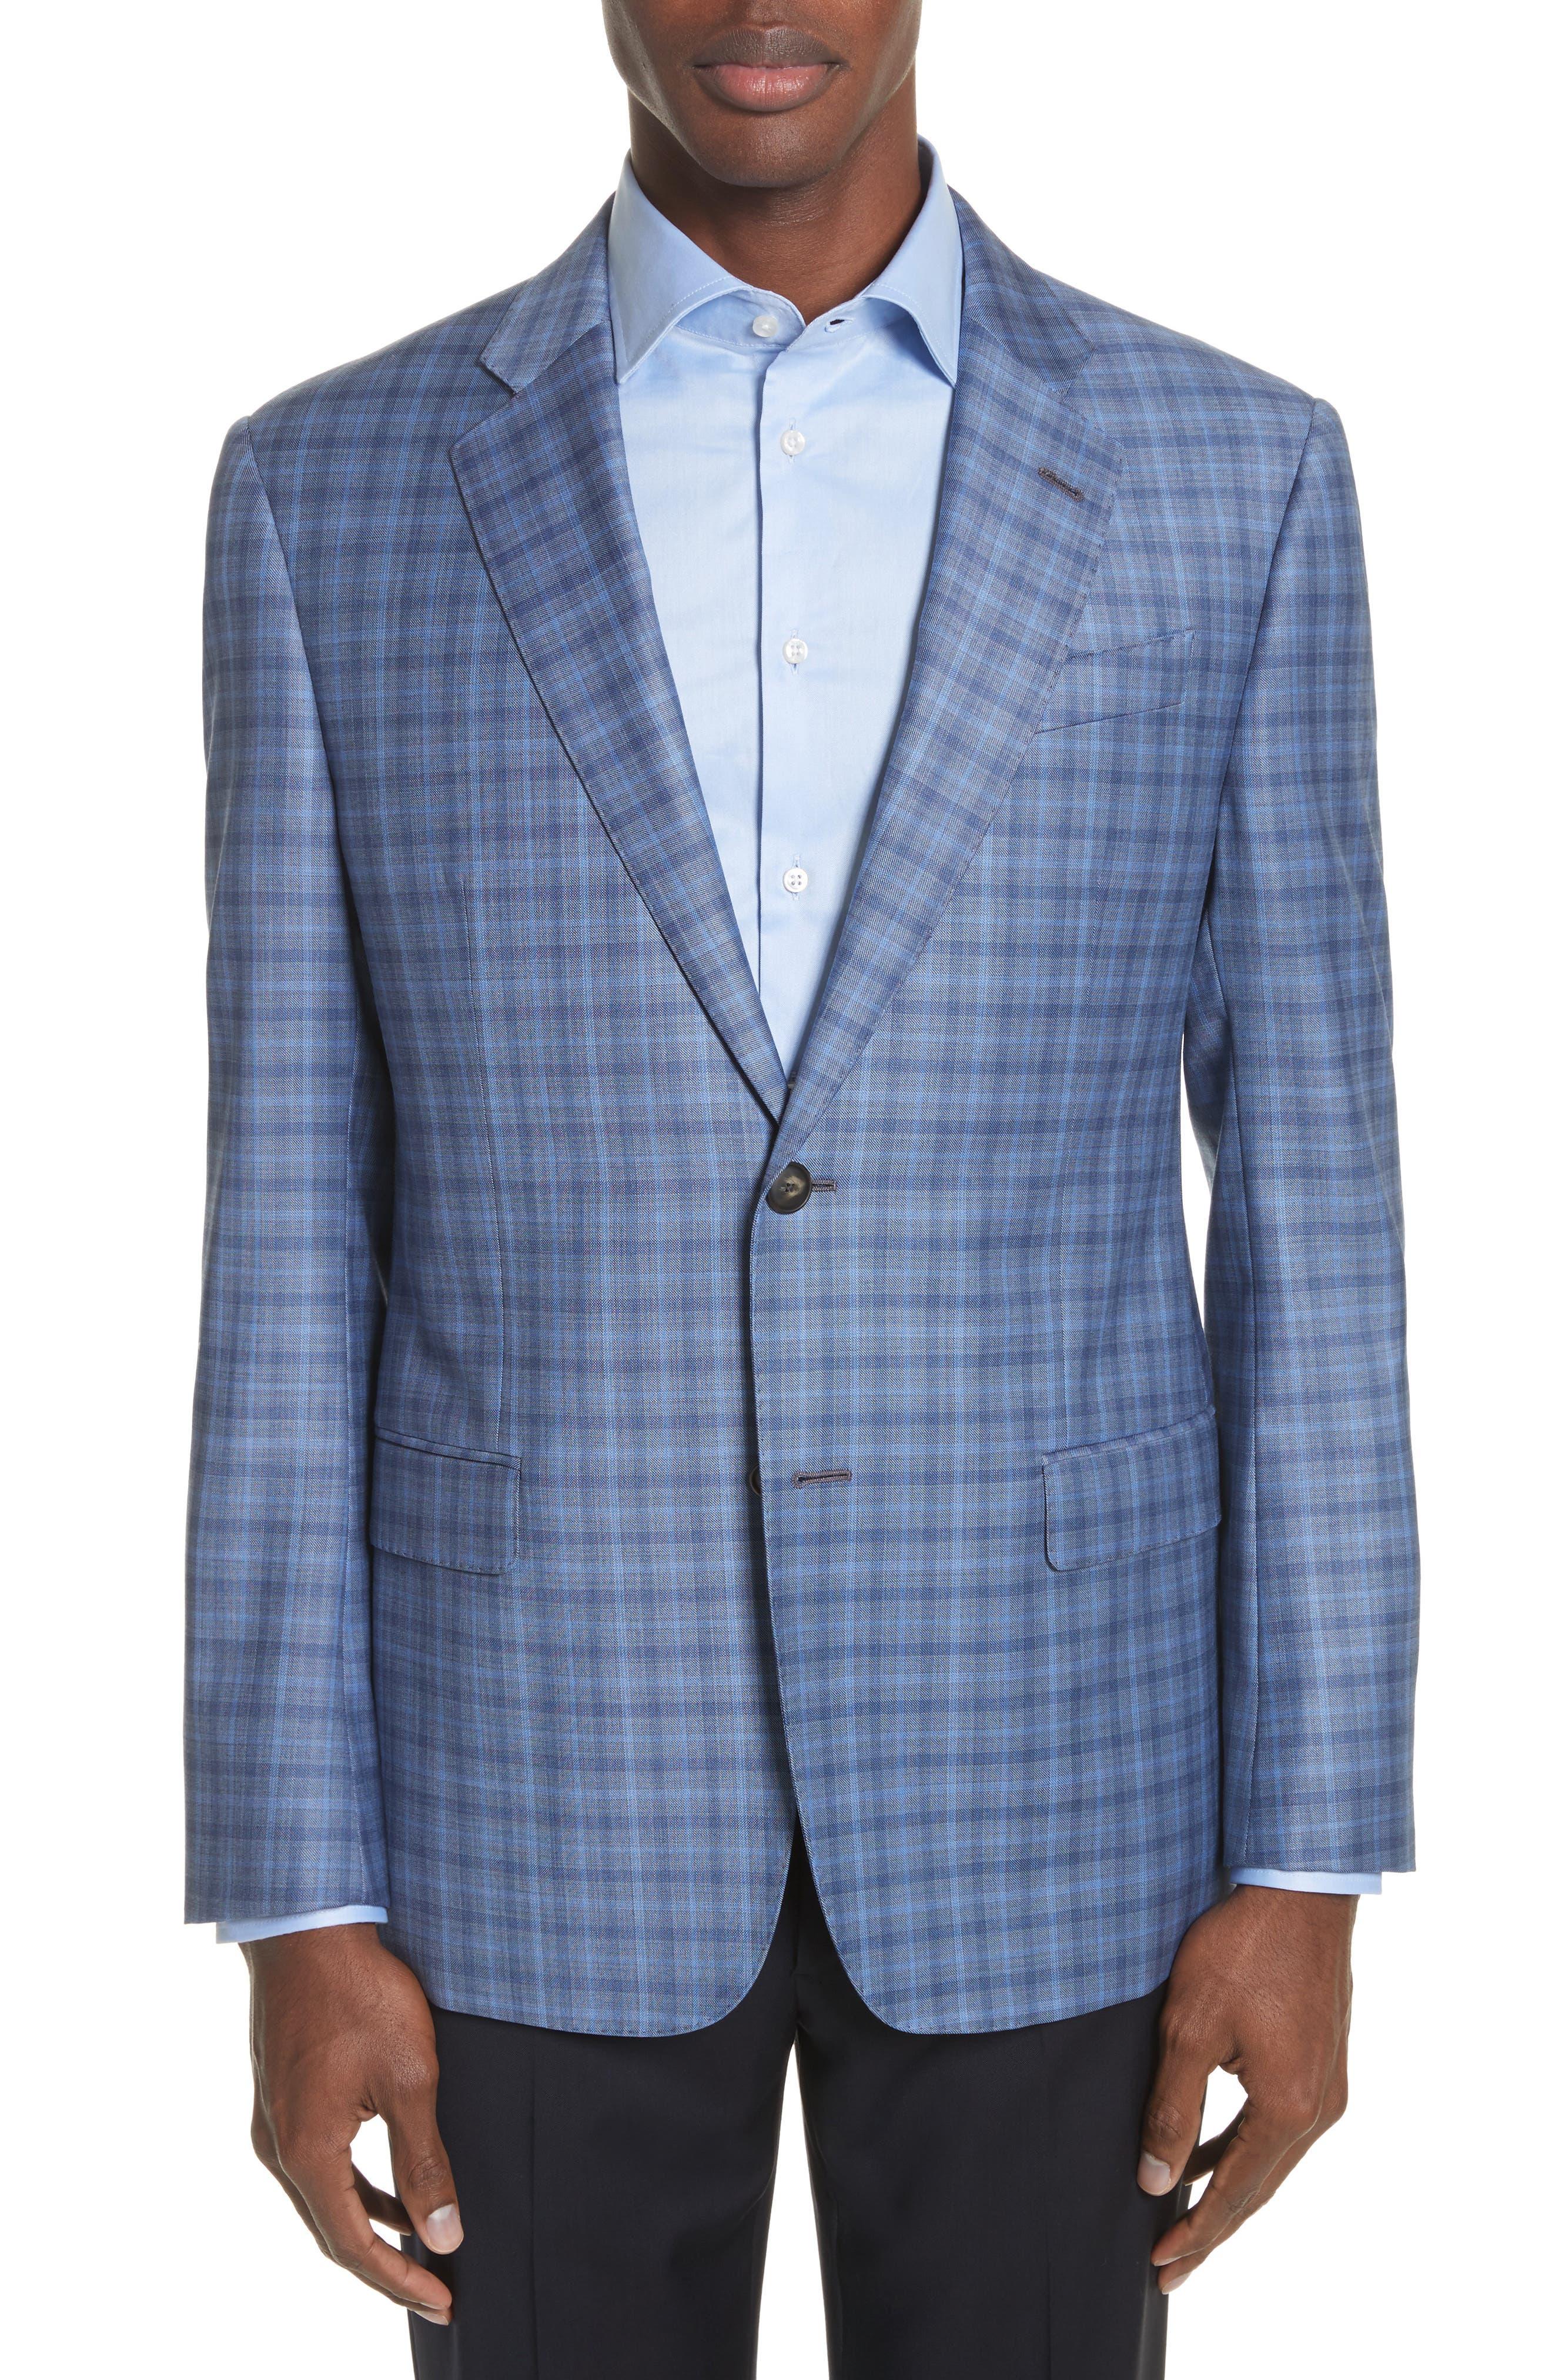 Main Image - Emporio Armani G Line Trim Fit Plaid Wool Sport Coat